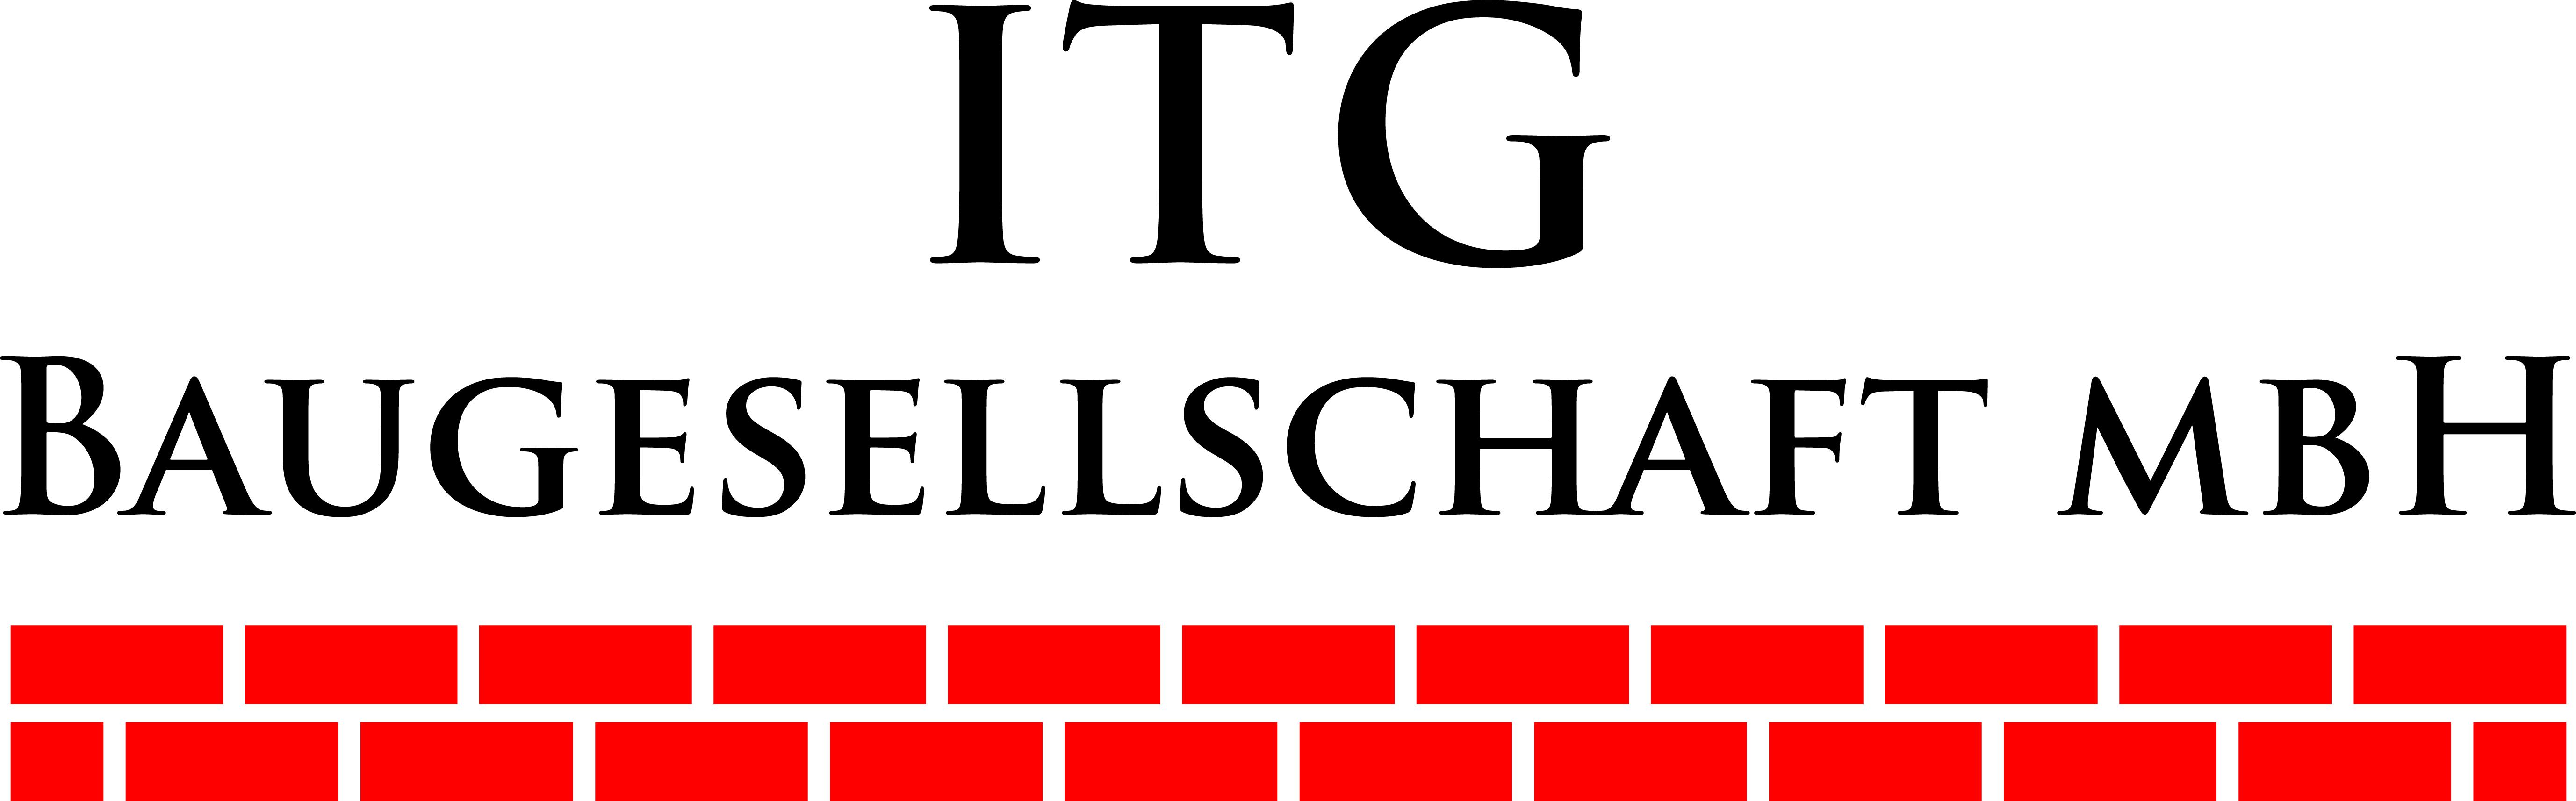 ITG Baugesellschaft mbH Köln Bauunternehmen Makler Immobilien